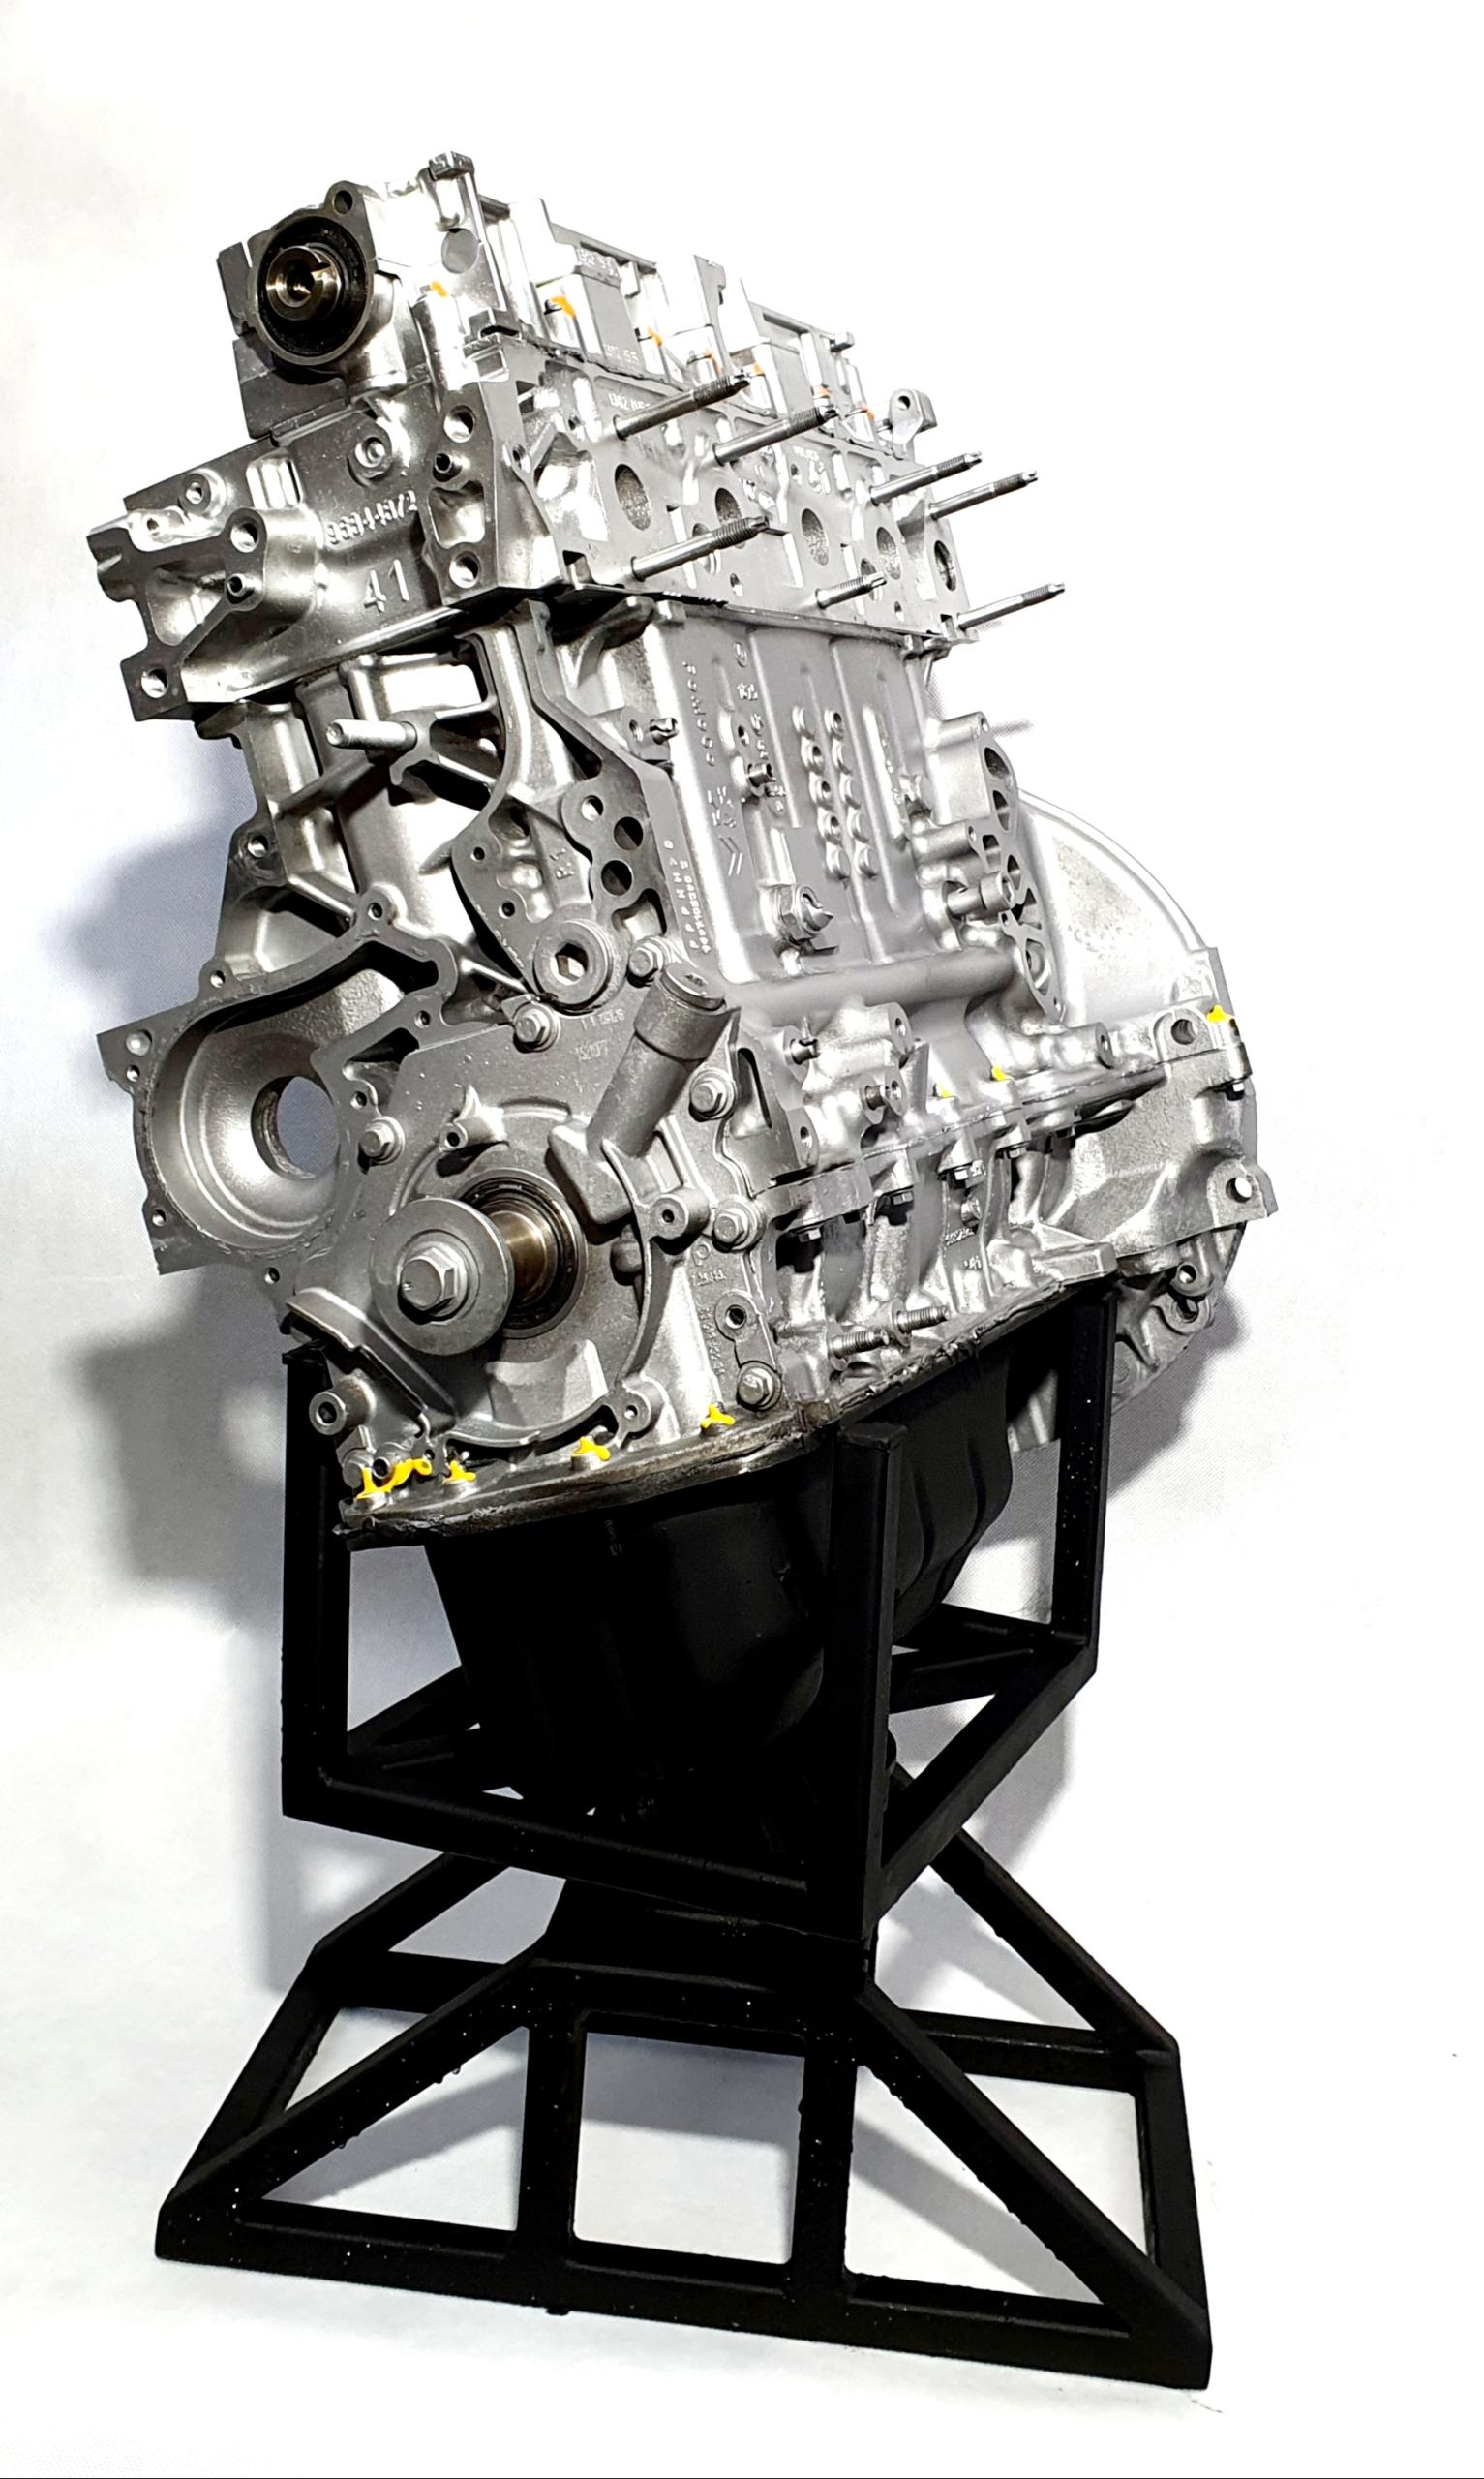 двигатель 16 hdi 9hh peugeot citroen+regenerowany